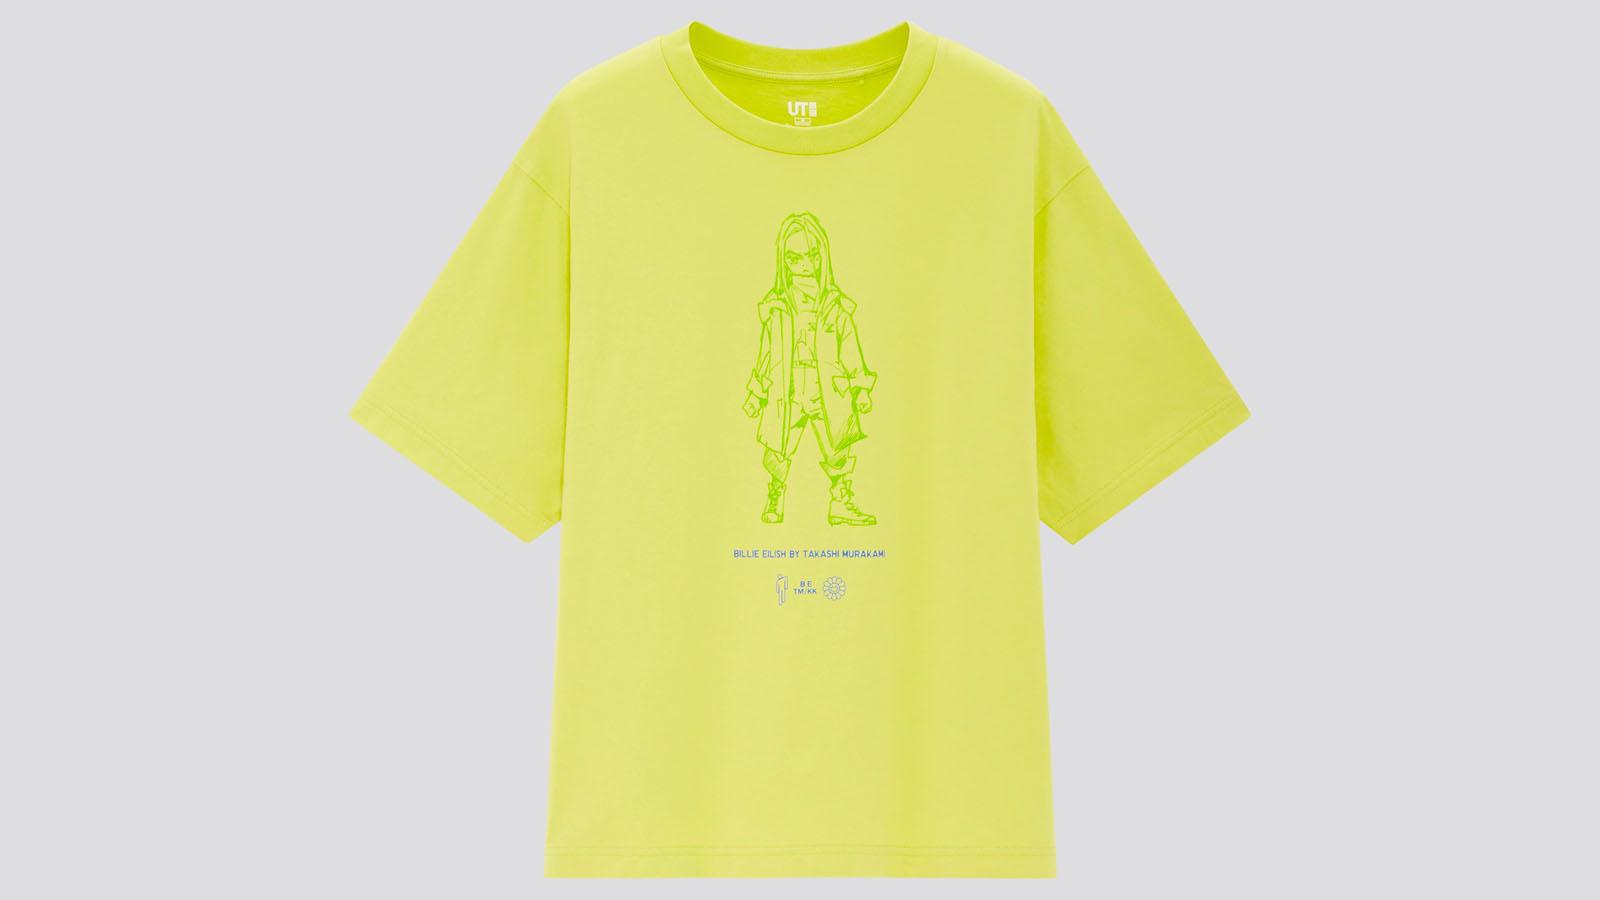 billie eilish uniqlo neon yellow